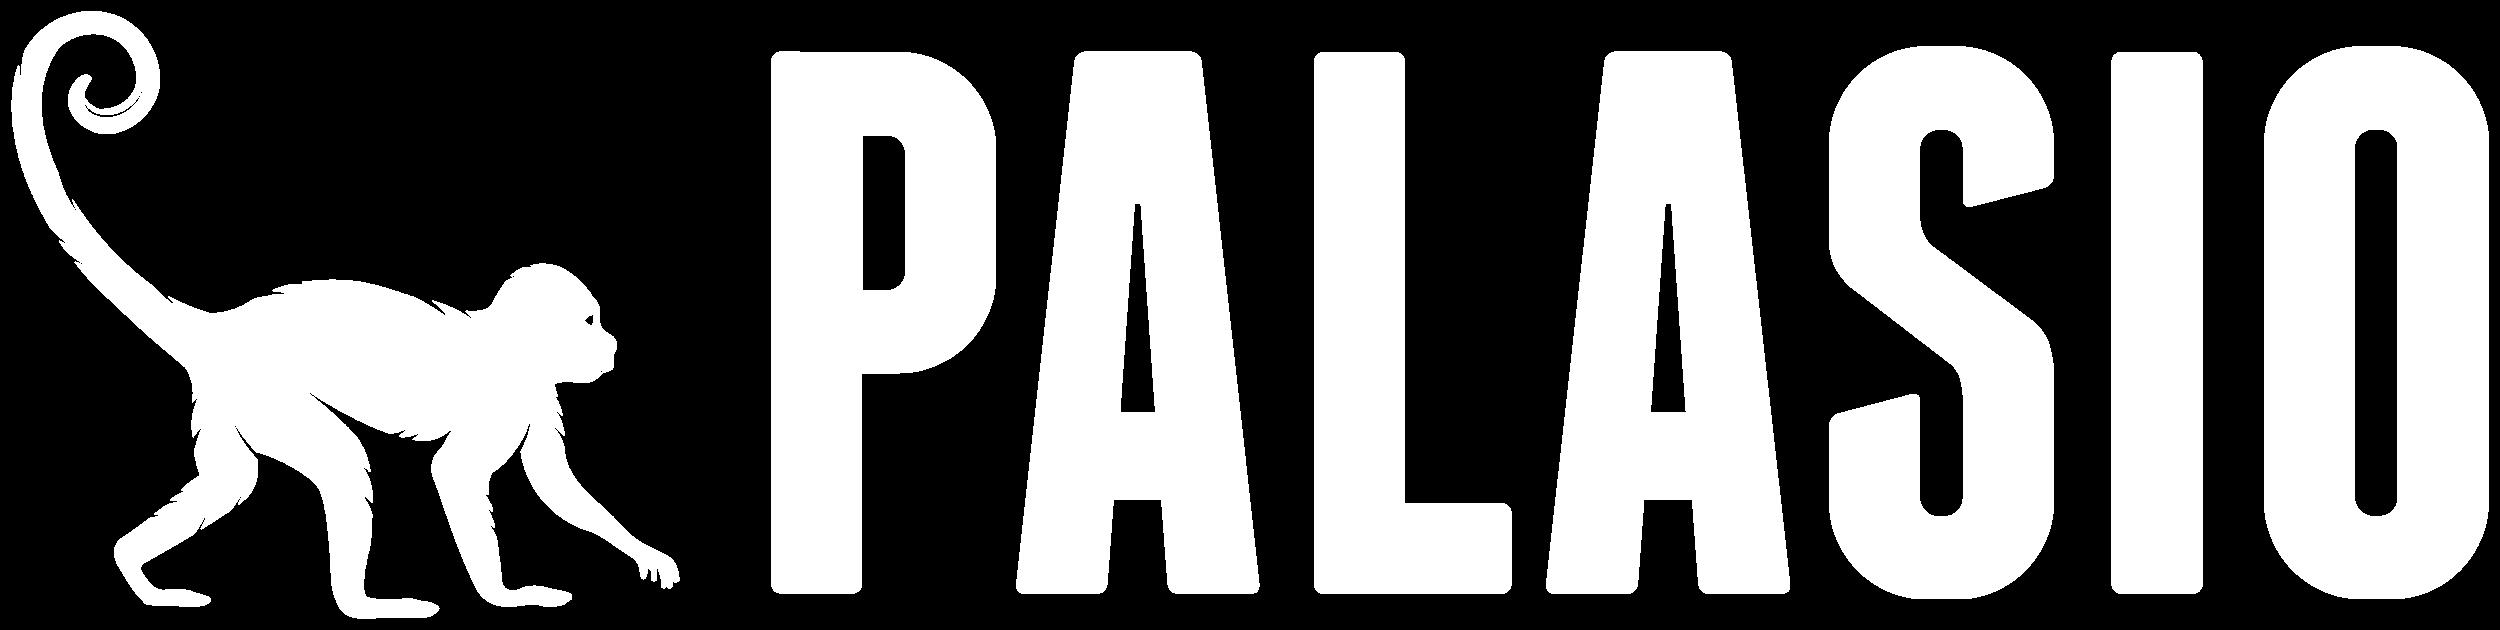 Palasio